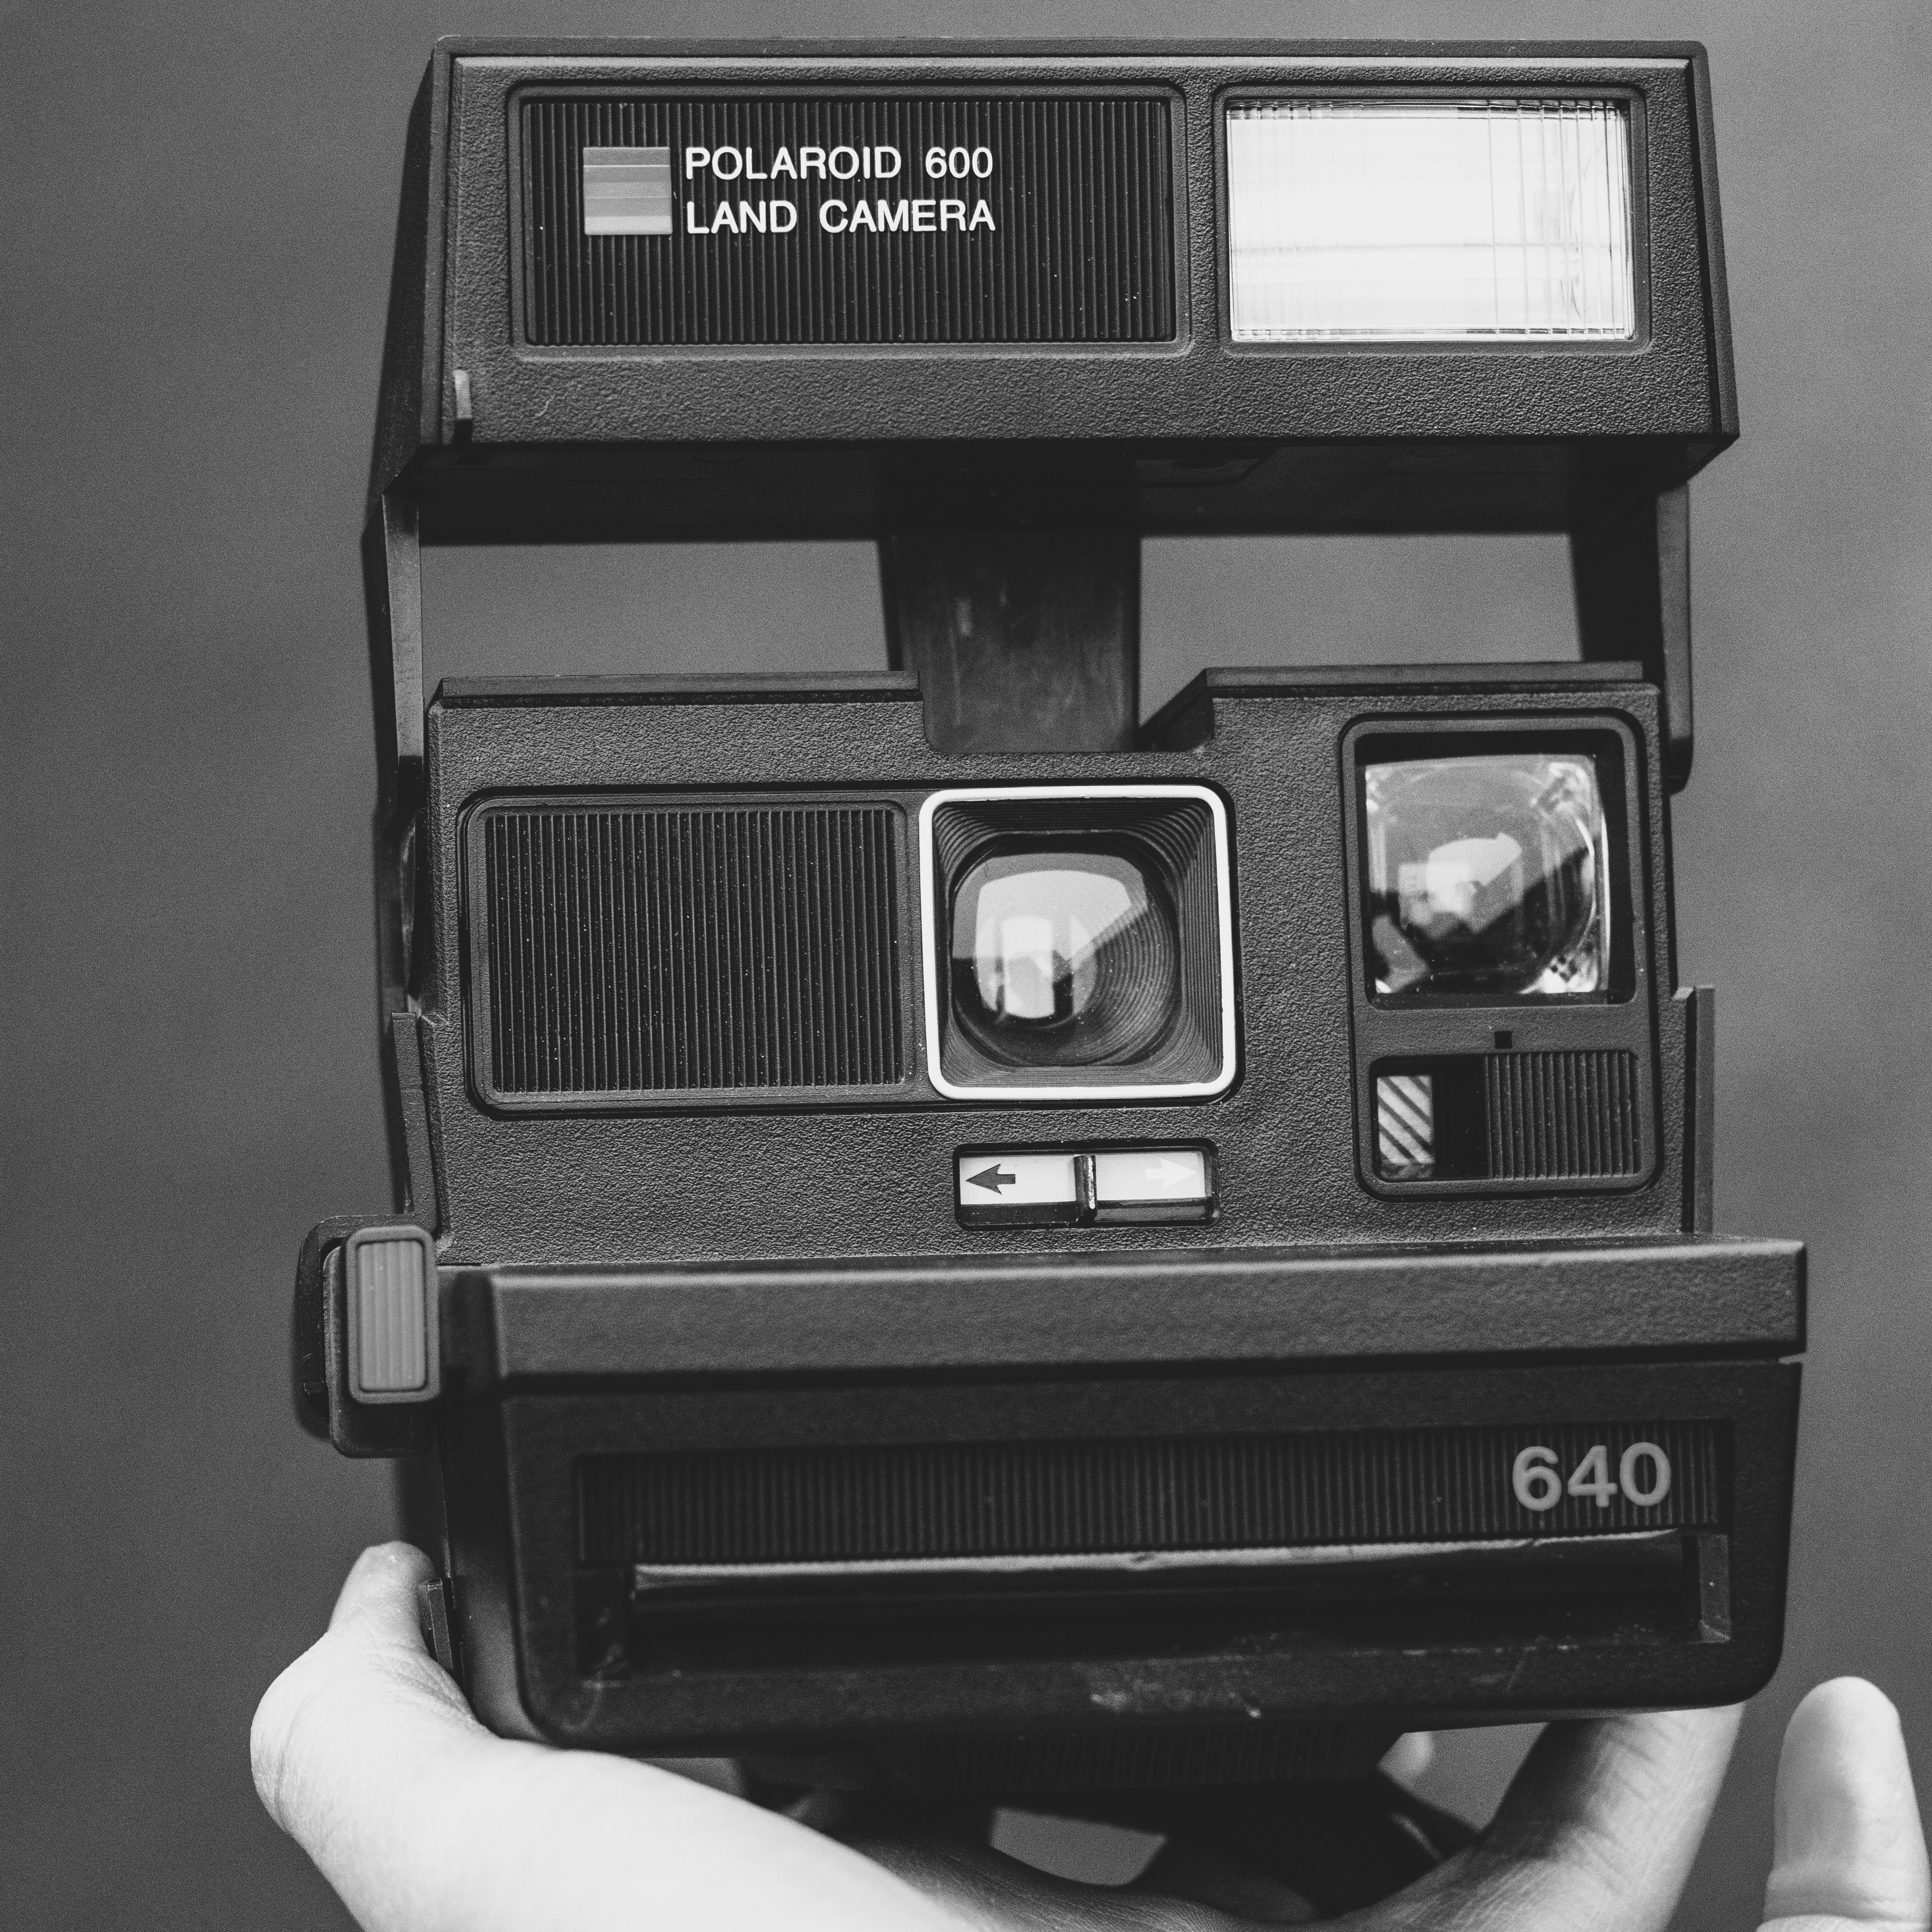 Polaroid Land Camera Grayscale Photo